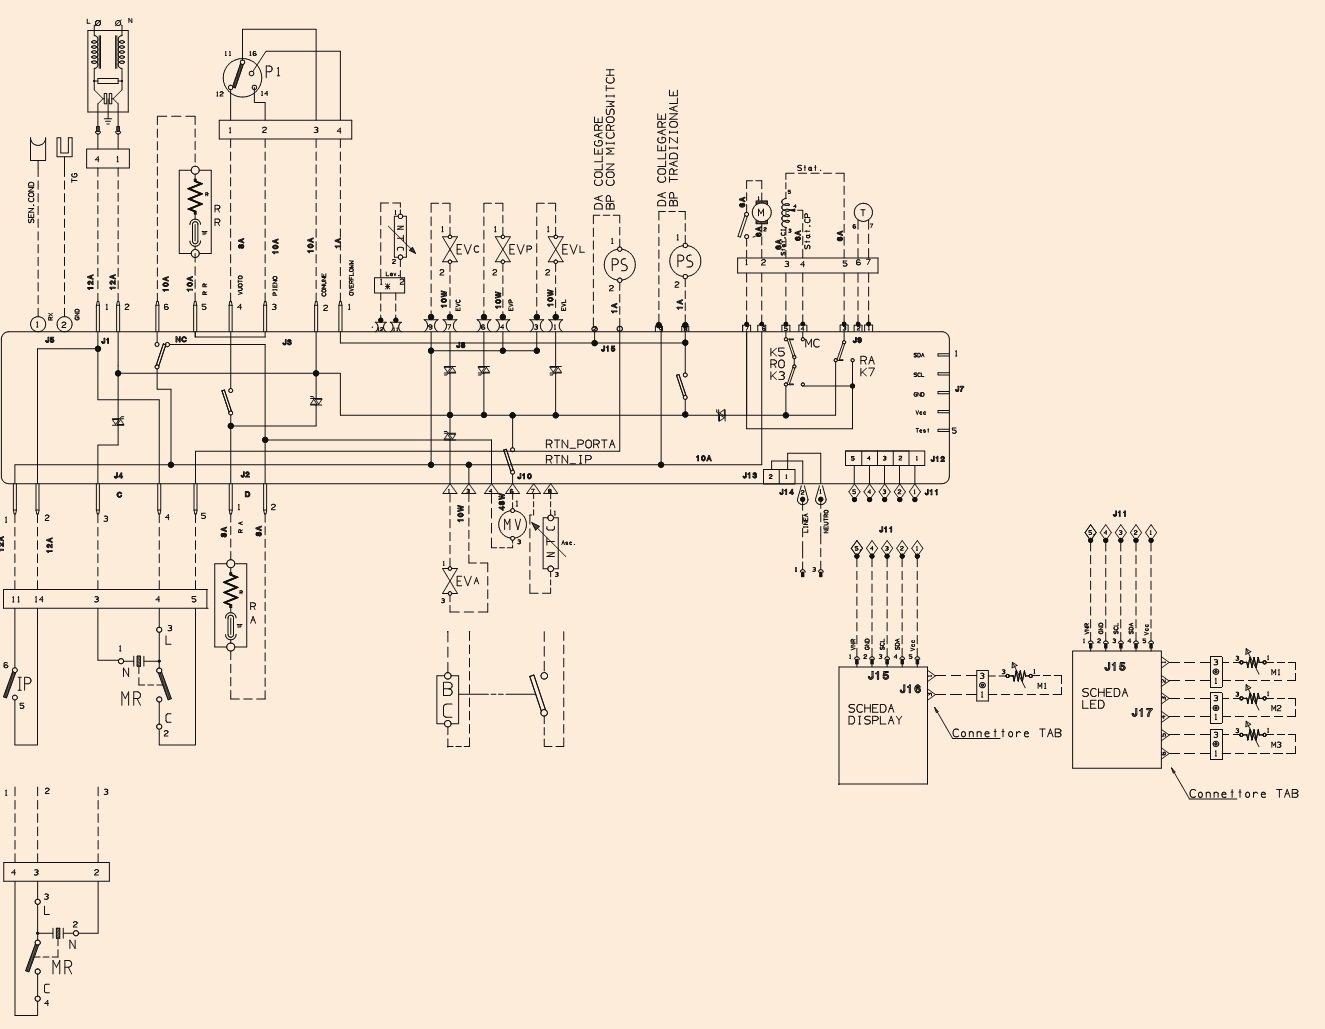 hobart oven wiring diagram hobart free engine image for user manual